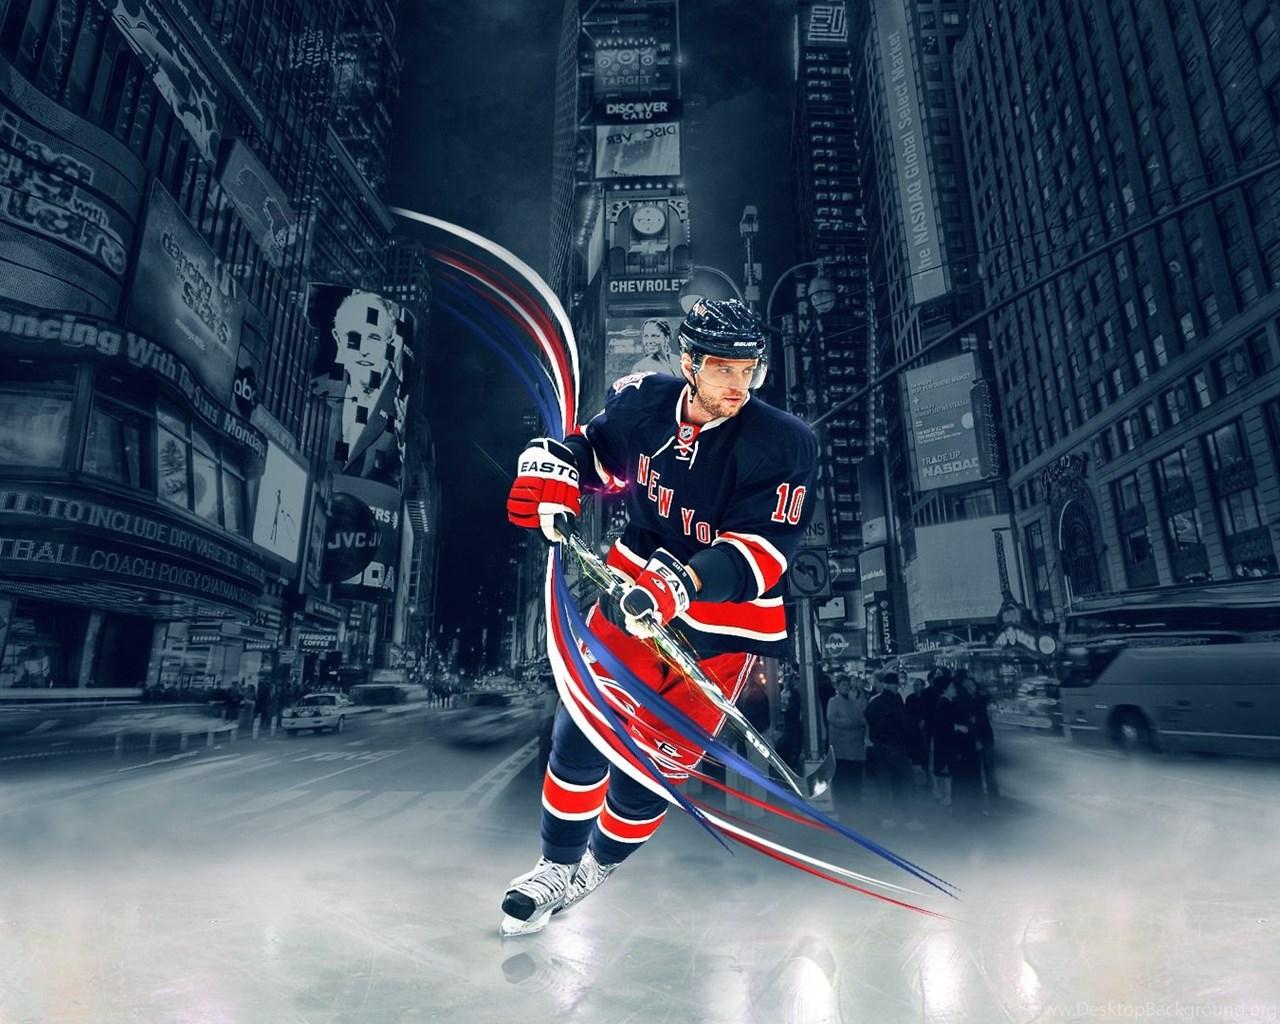 Nhl New York Rangers Hockey Player Wallpapers Hd Free Desktop Desktop Background